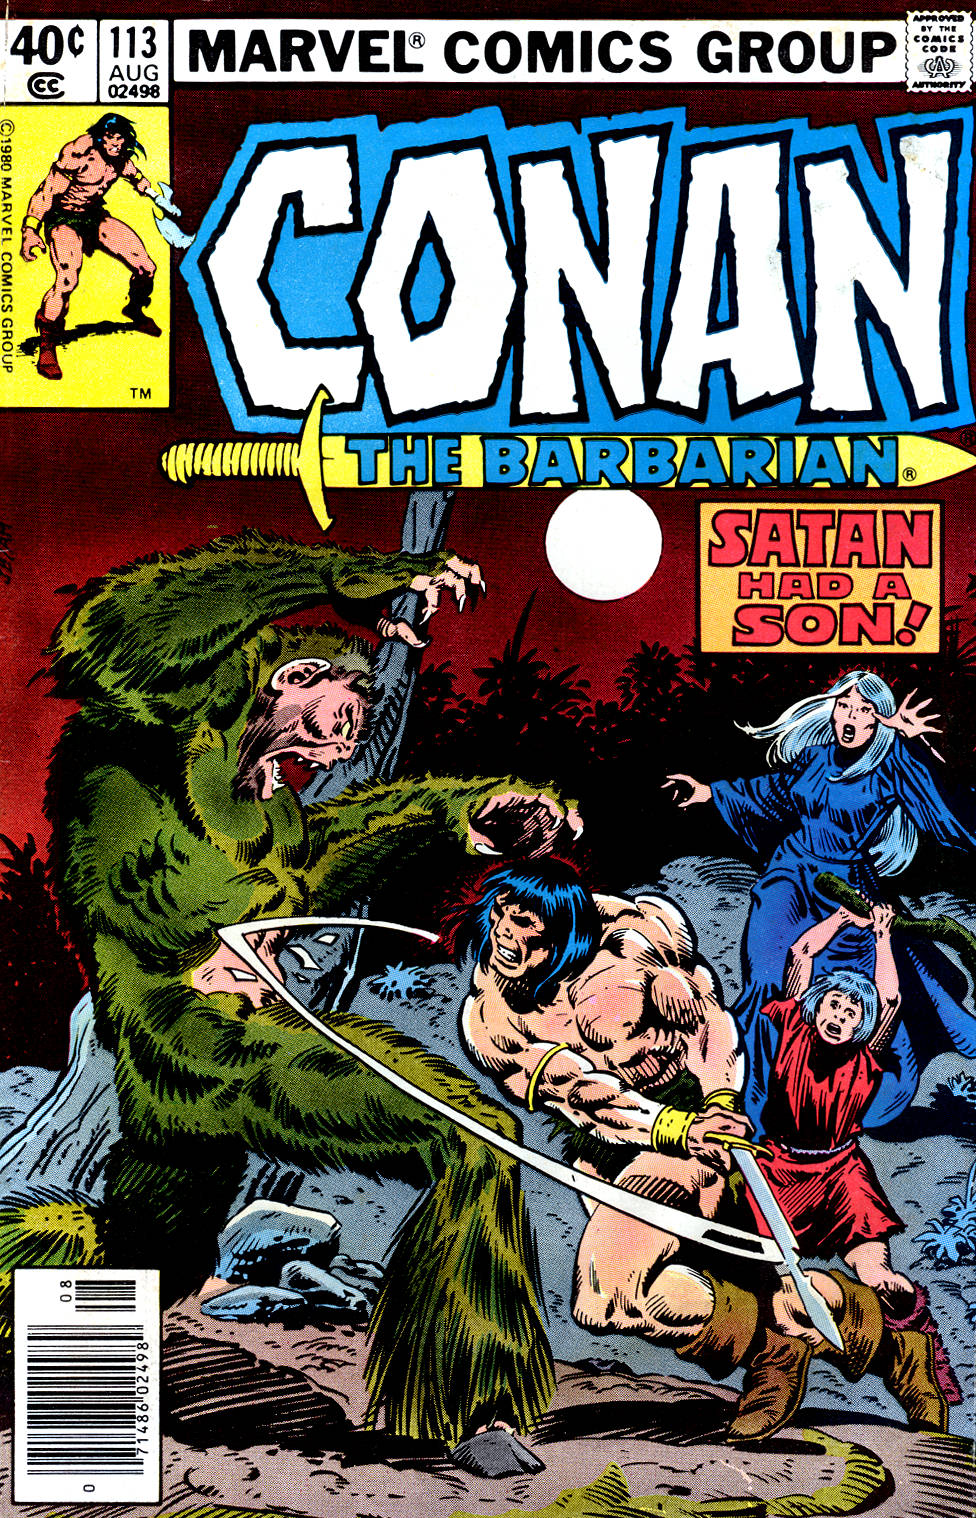 Conan the Barbarian 113